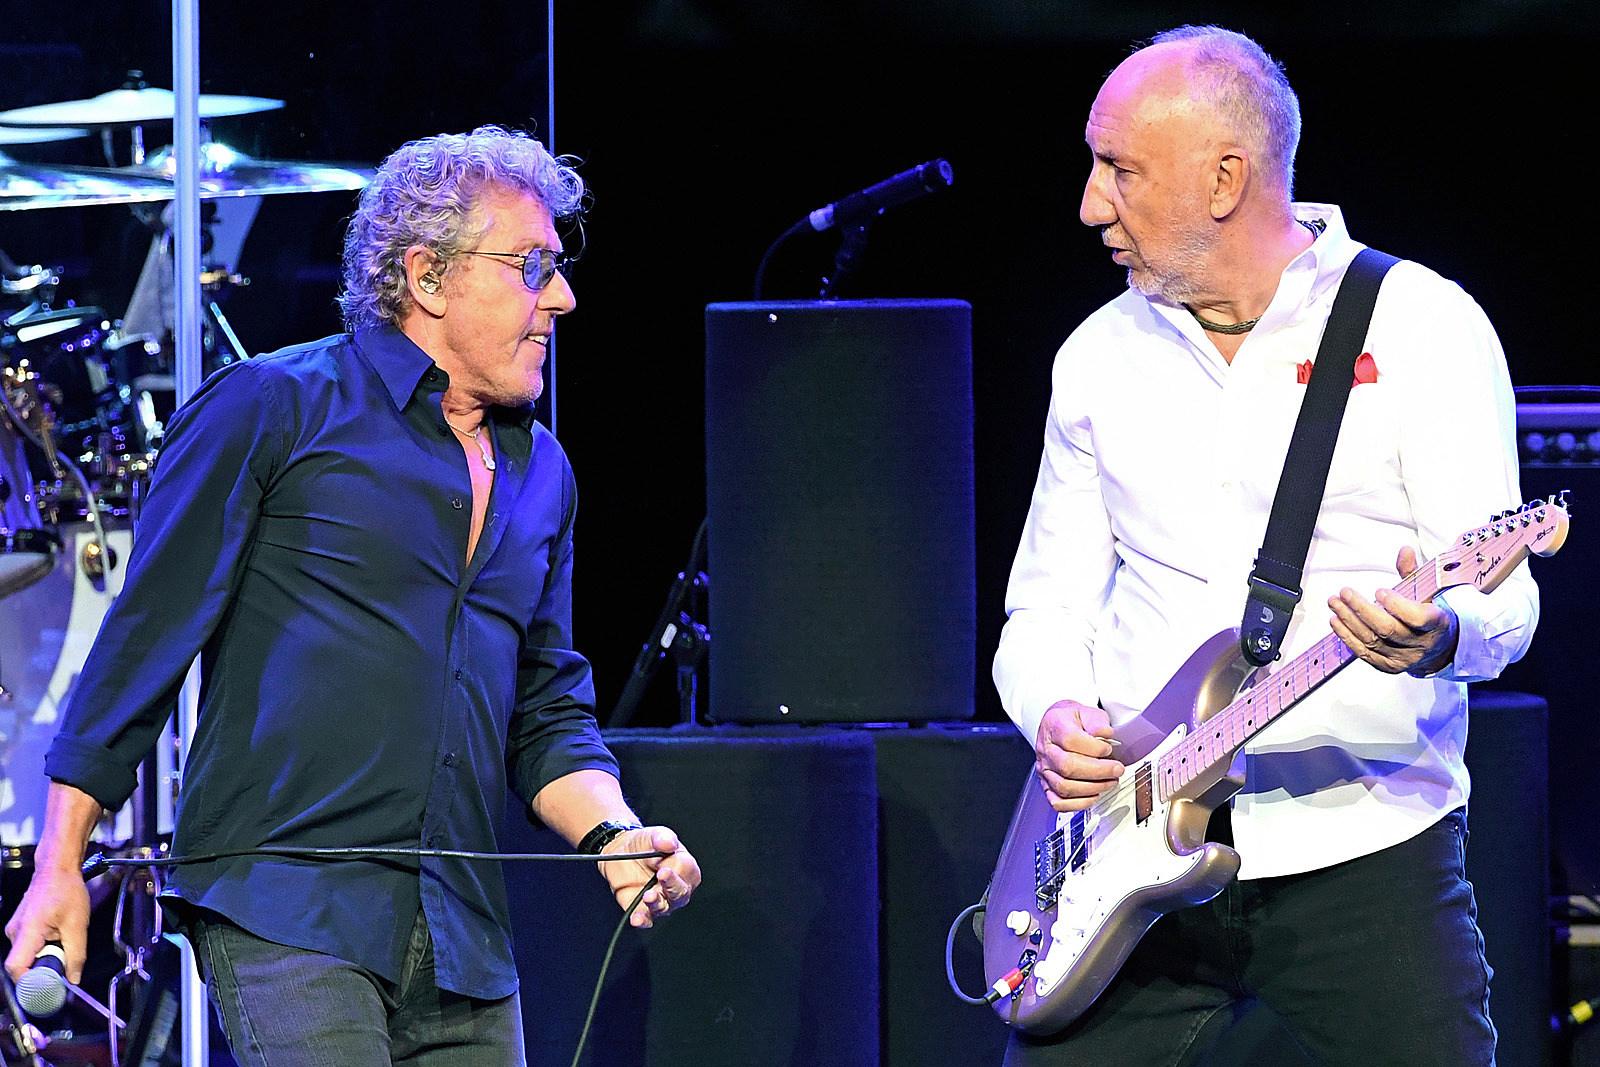 Pete Townshend Saved Roger Daltrey's New Solo Album